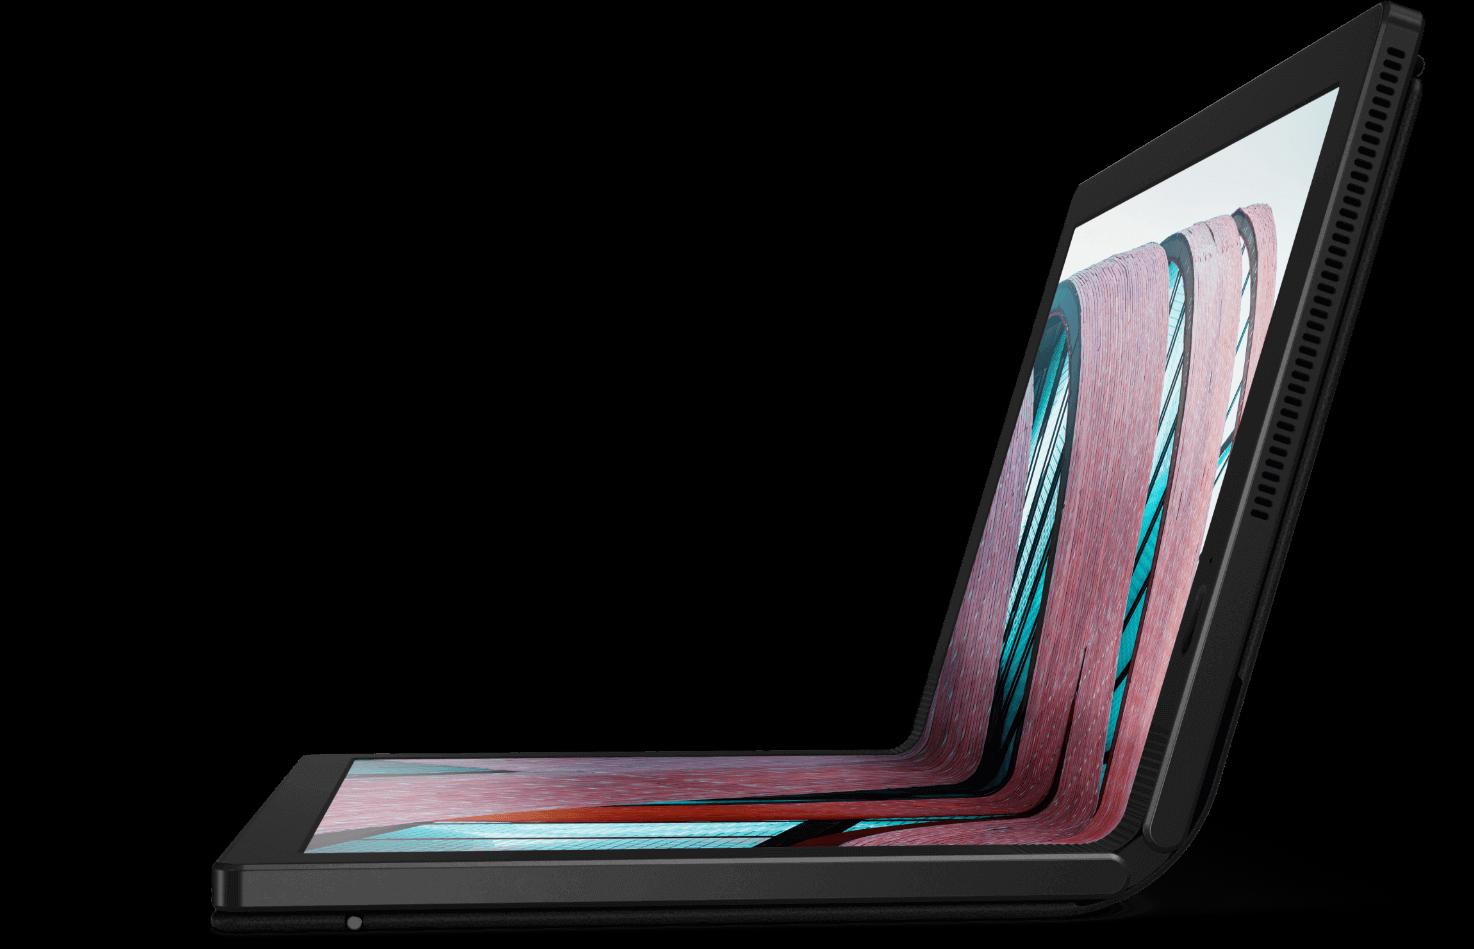 Vista lateral izquierda de Lenovo ThinkPad X1 Fold abierto a unos 95 grados